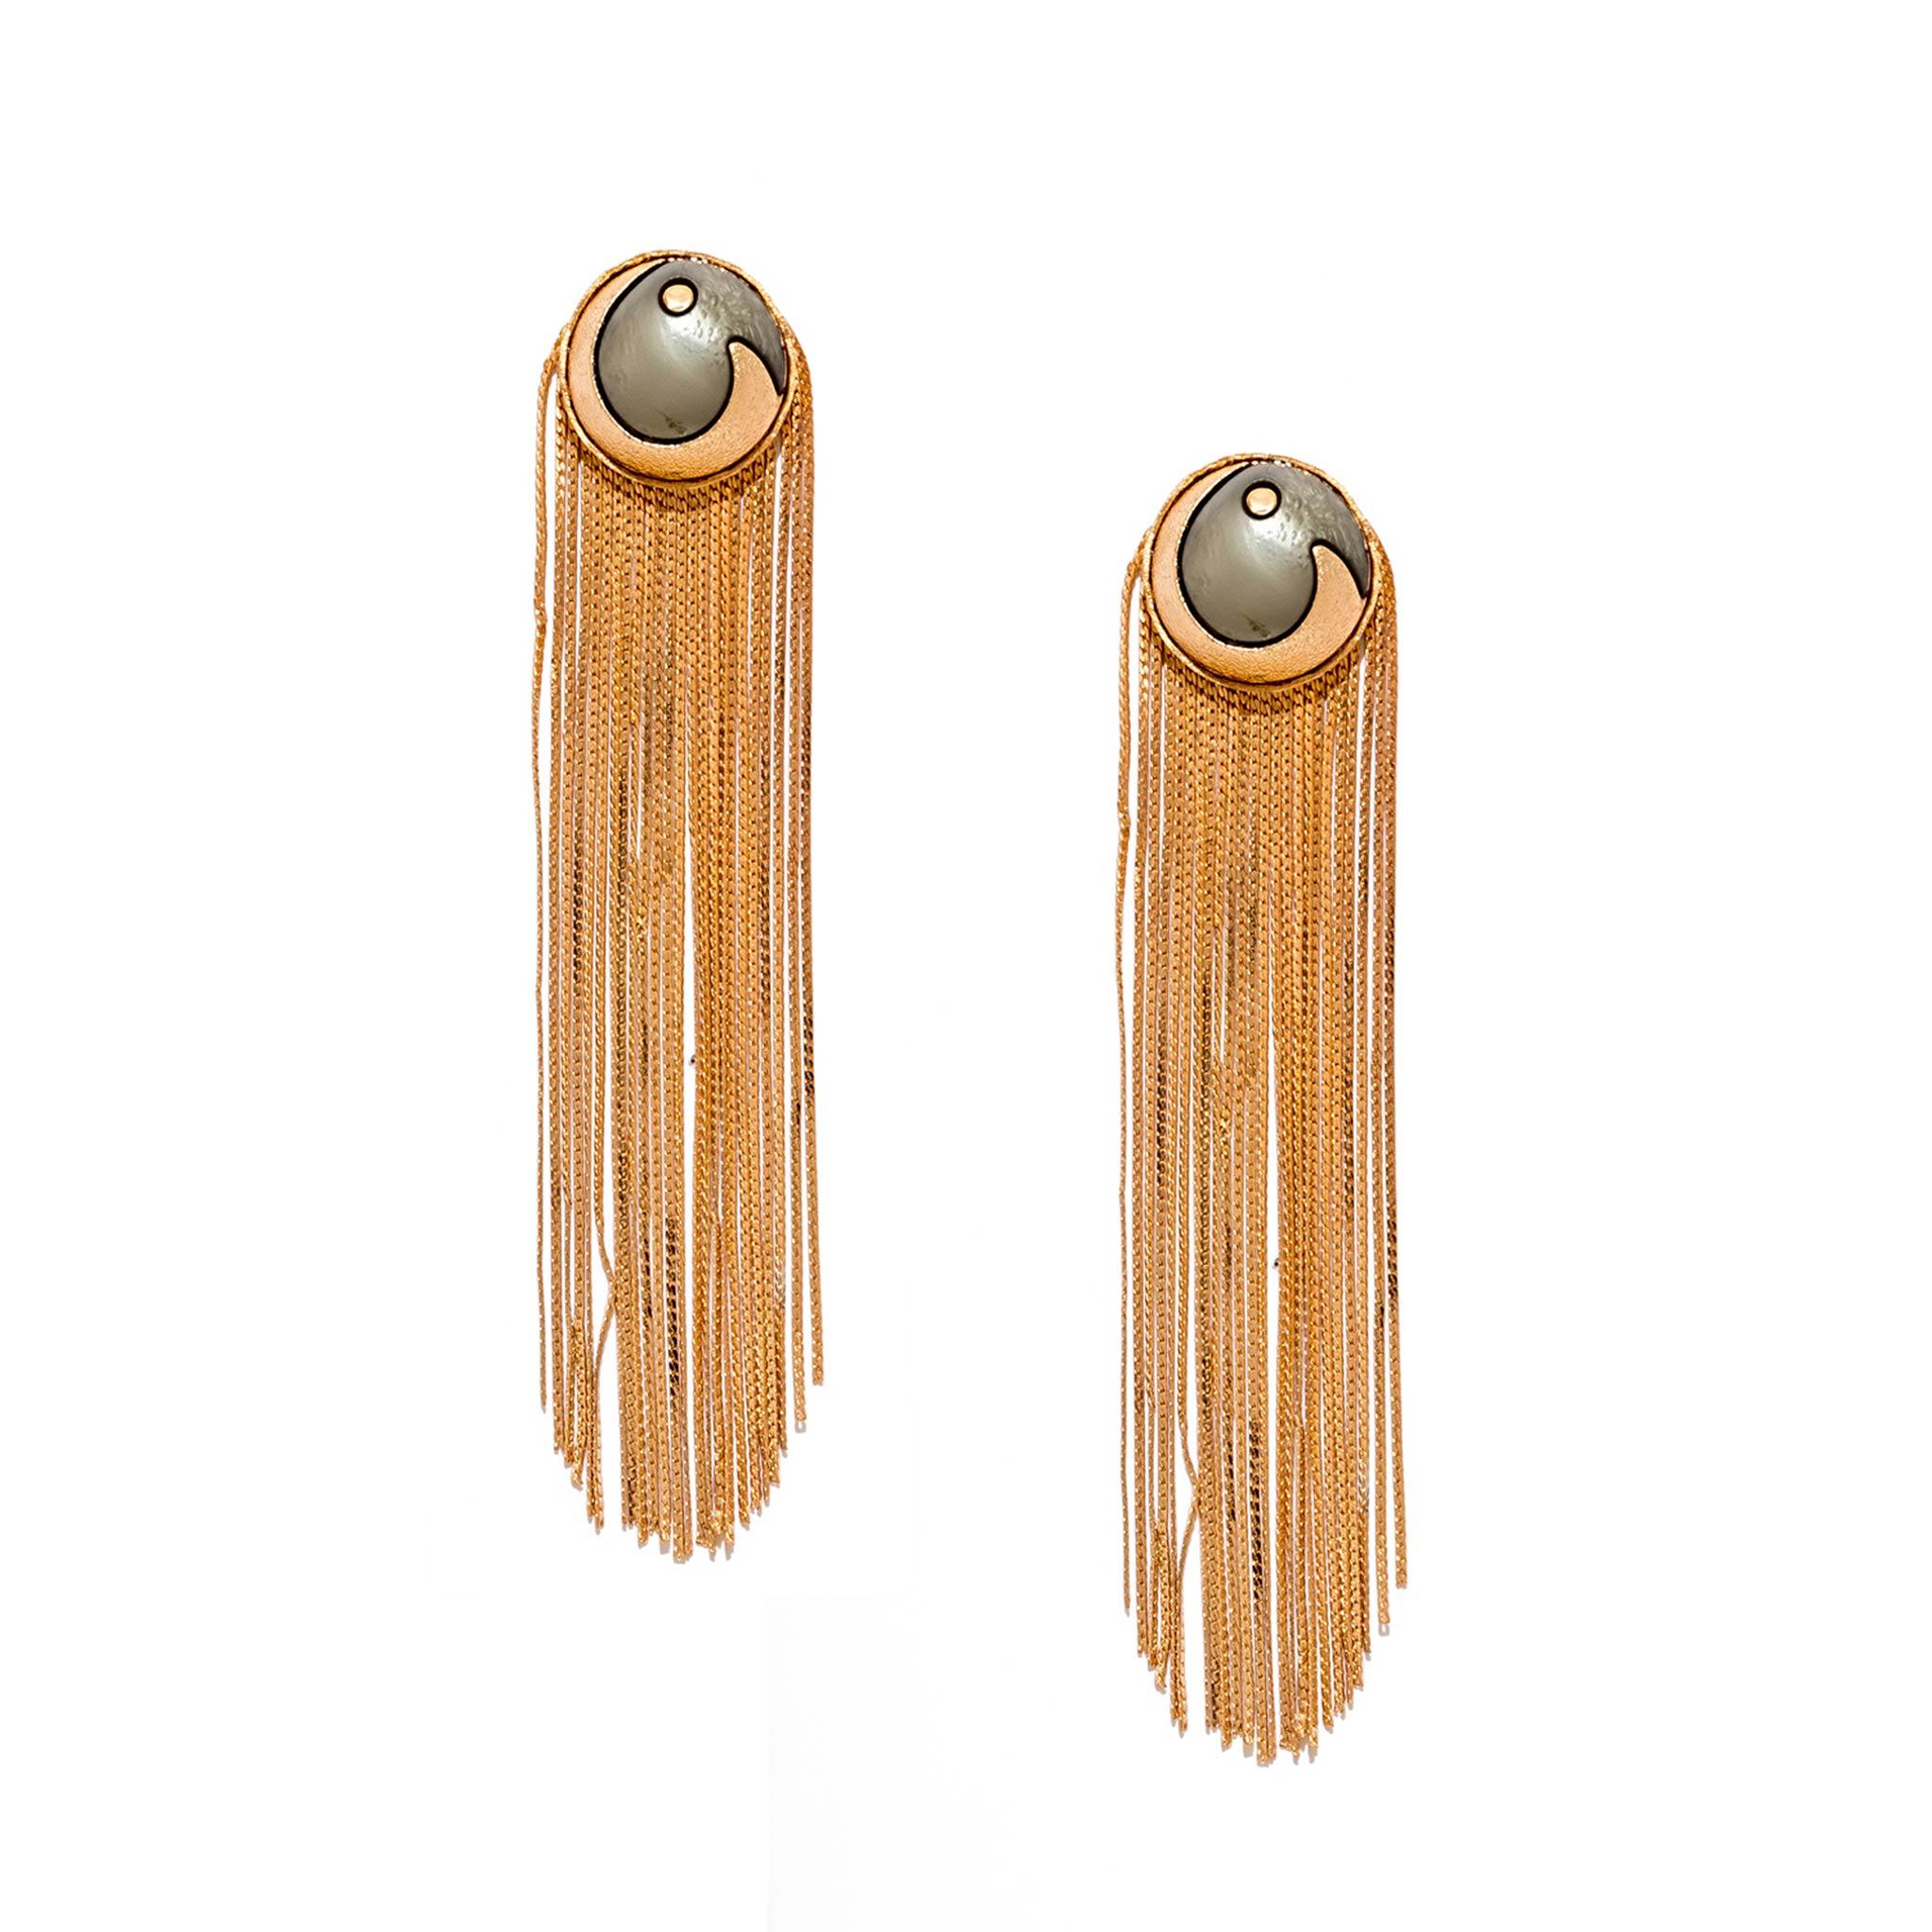 Valliyan Nitya Arora Gold Plated Metallic Tassel Earrings